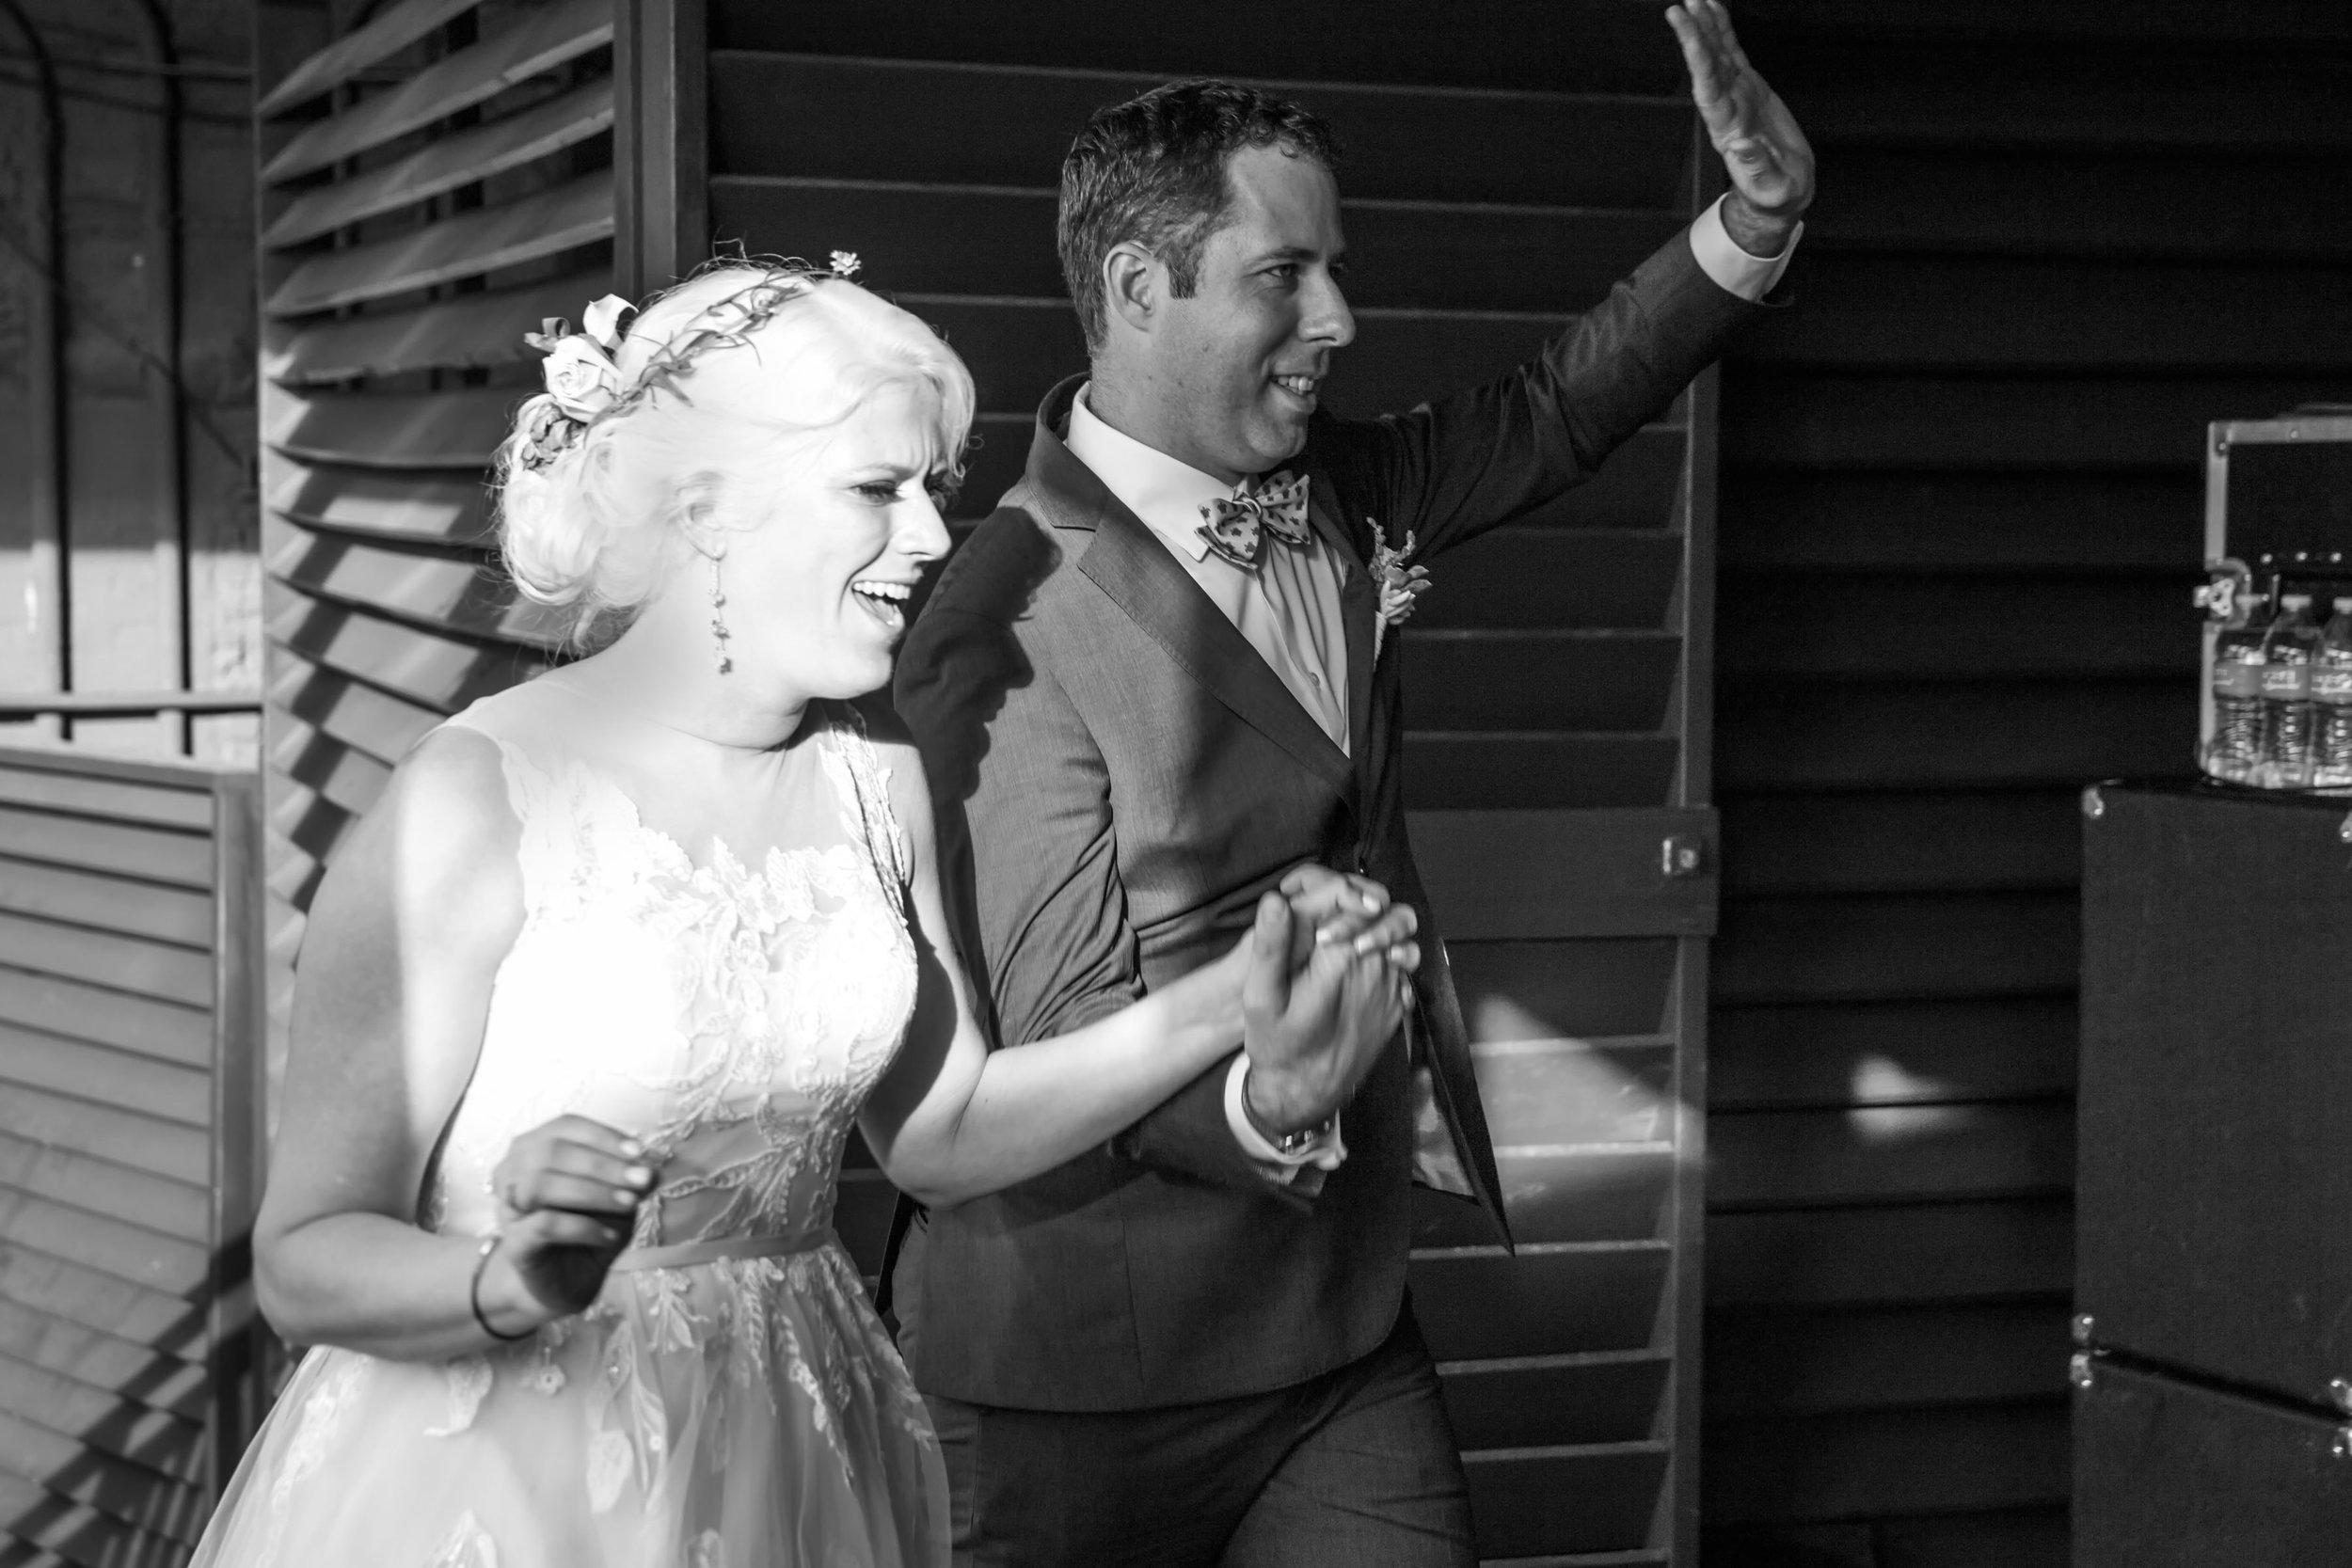 128-South-Wedding-Wilmington-NC-Photographer-Reception-13.jpg